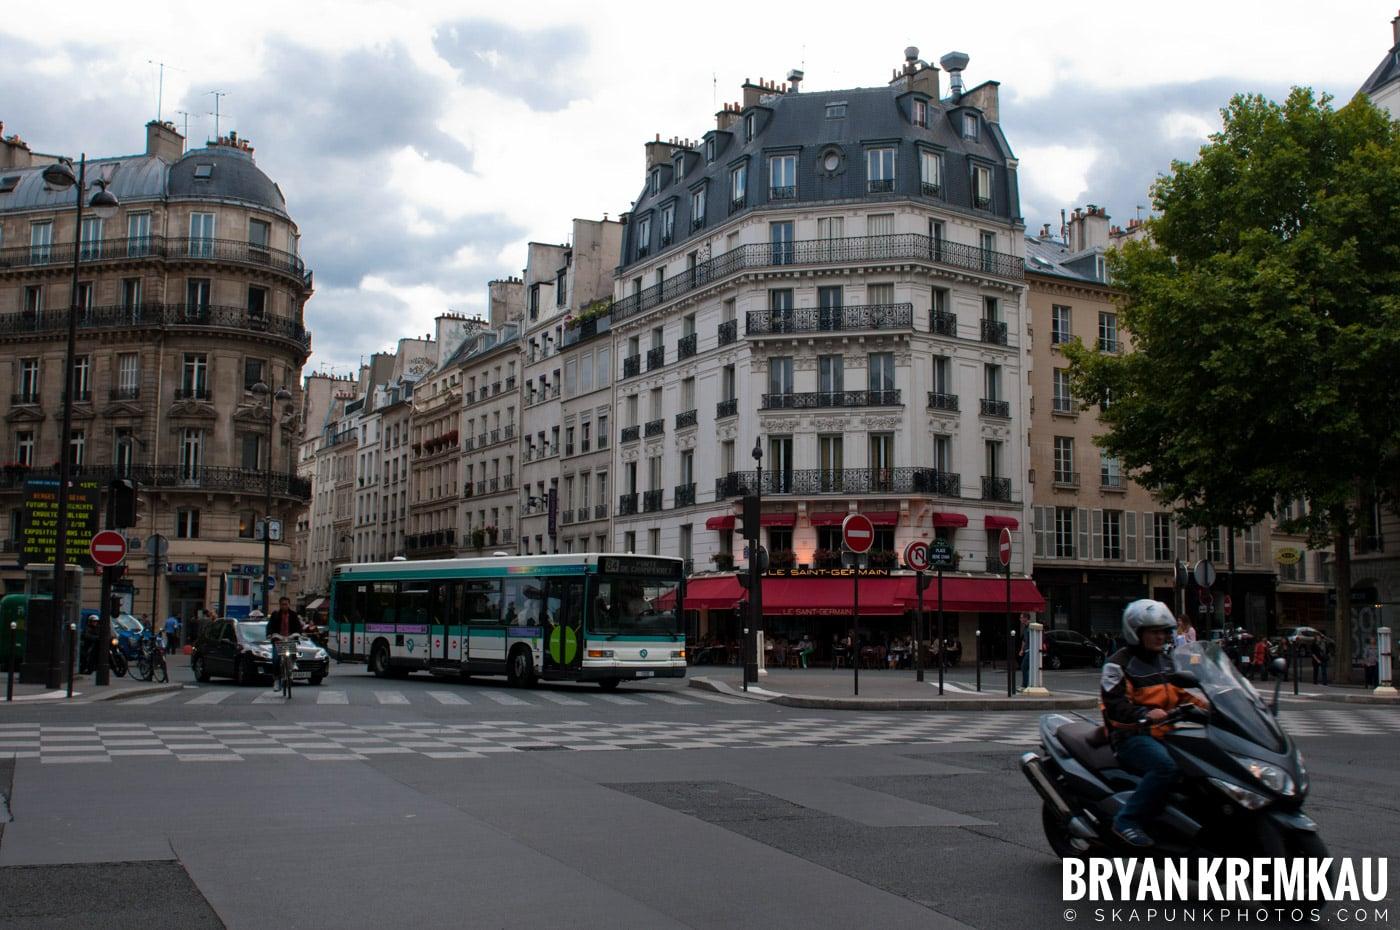 Paris, France Honeymoon - Day 1 - 7.18.11 (12)